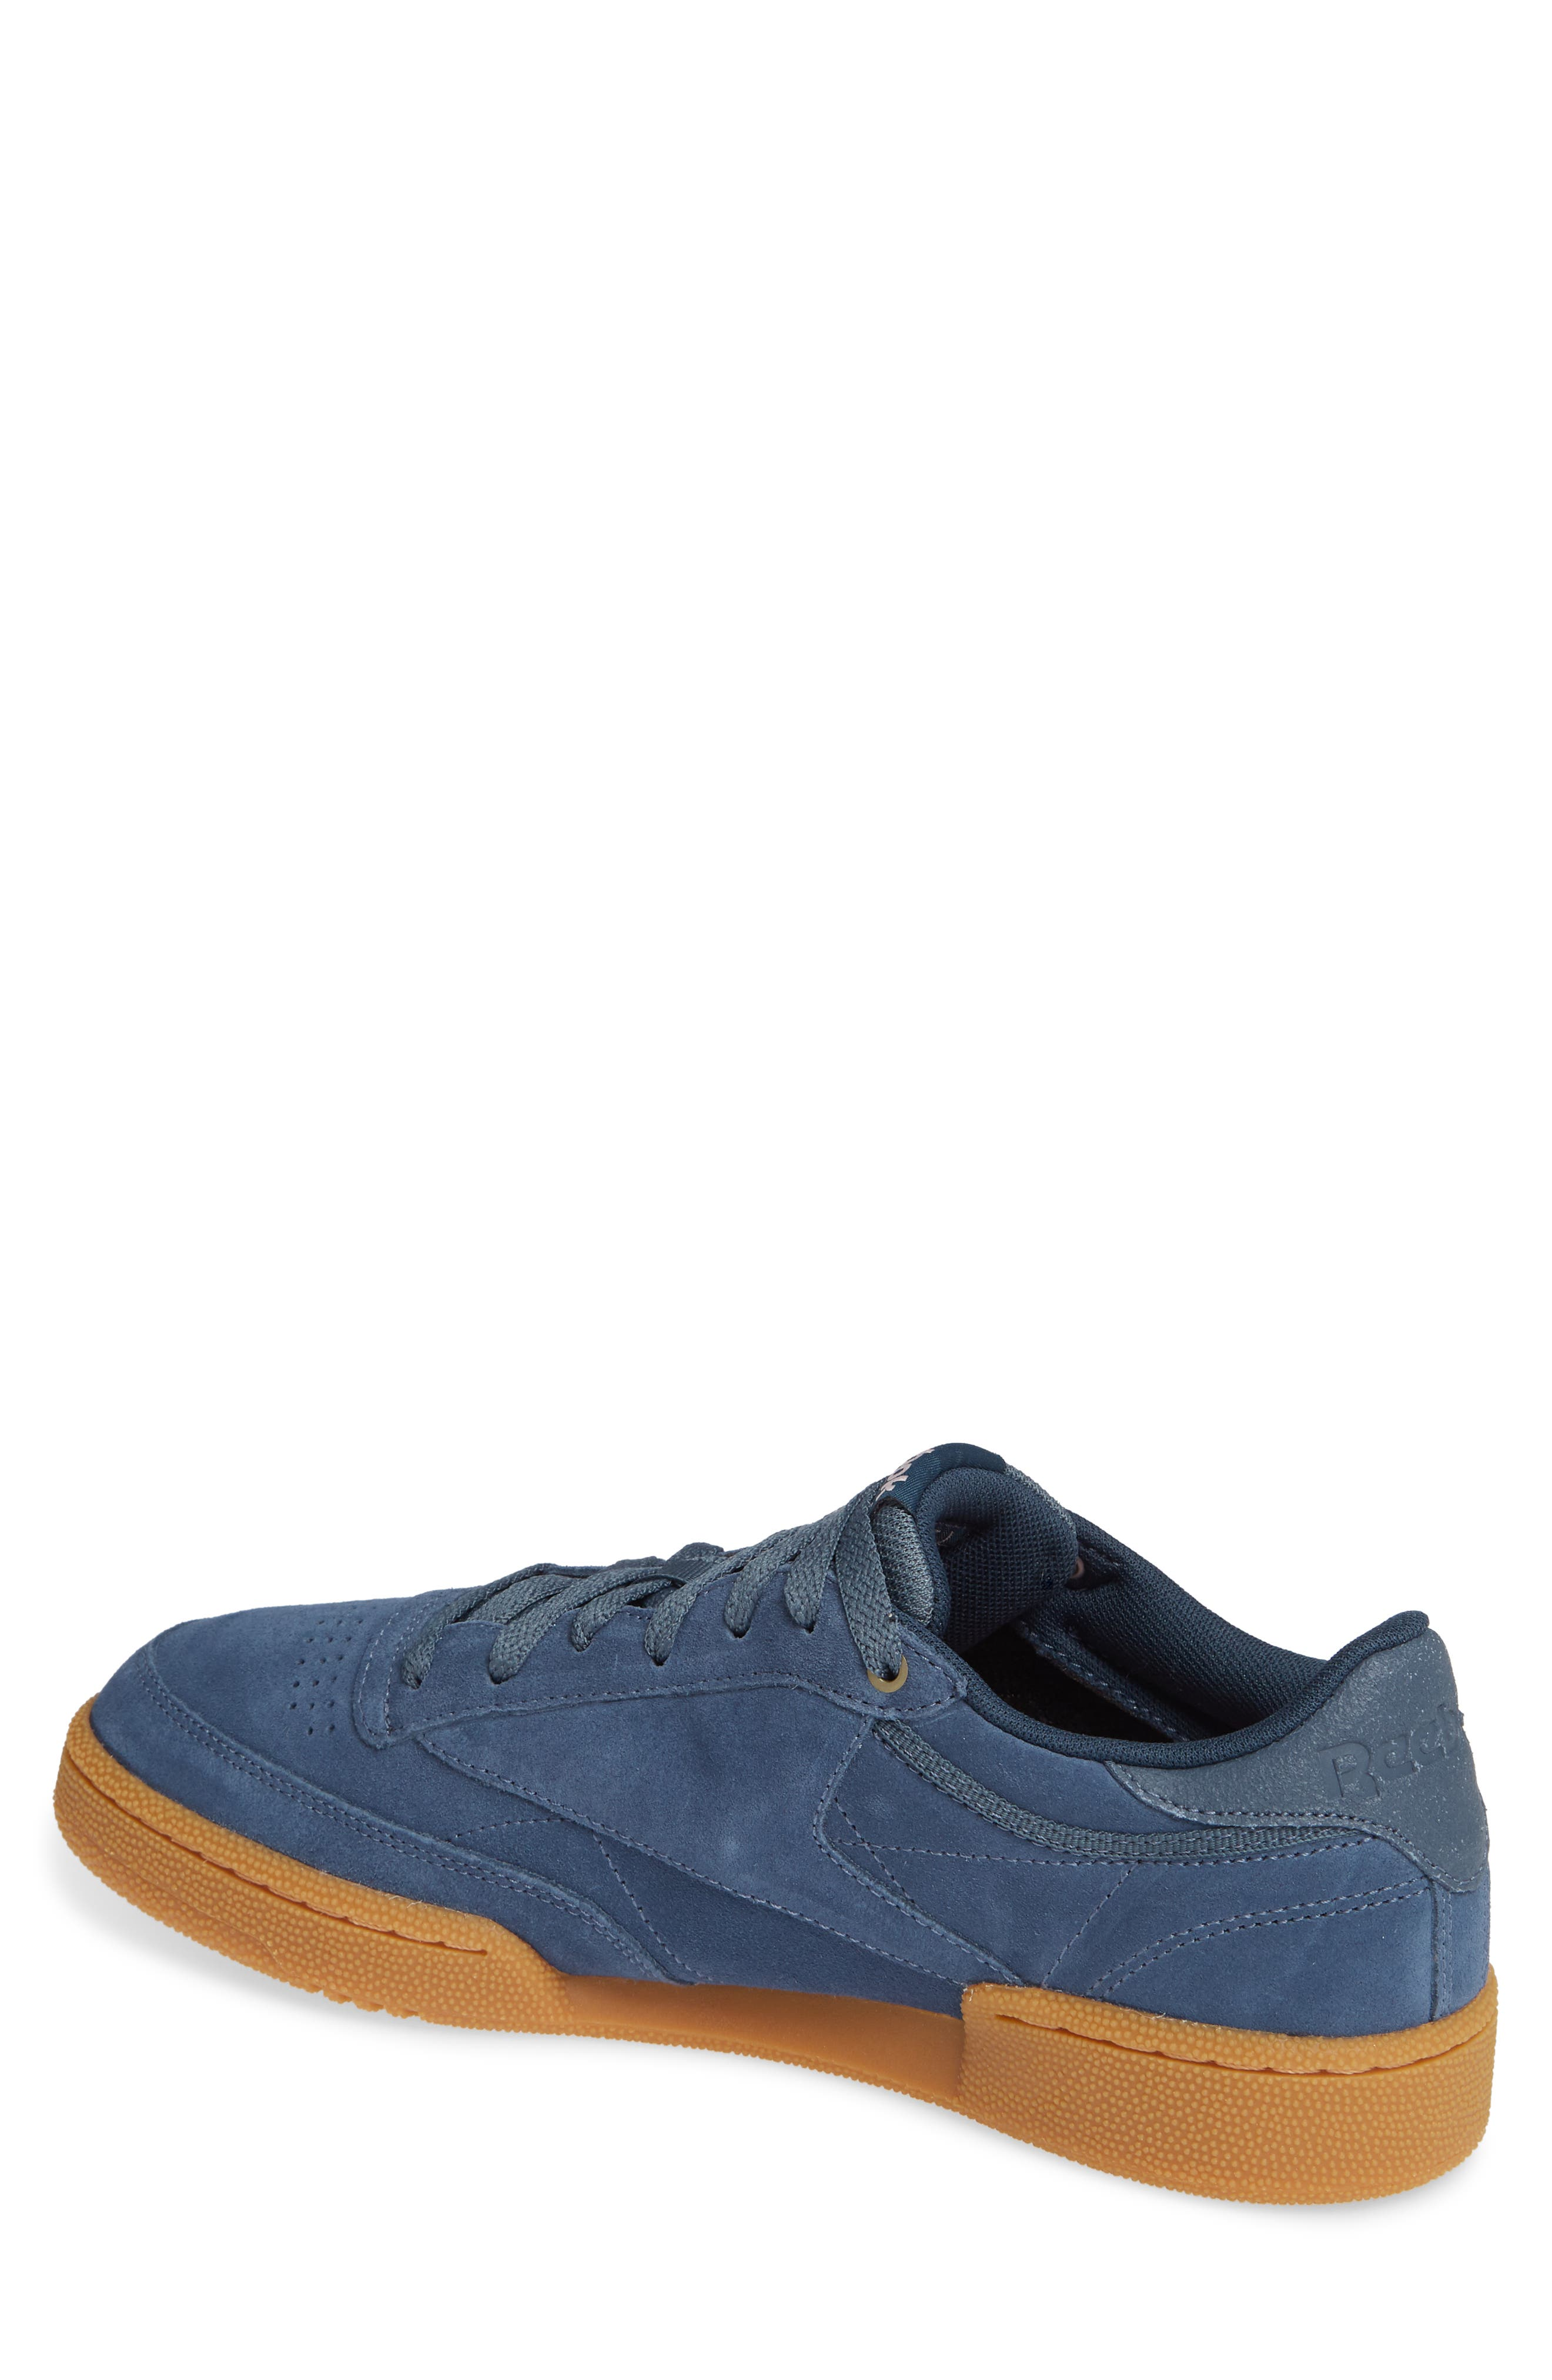 Club C 85 MU Sneaker,                             Alternate thumbnail 2, color,                             400